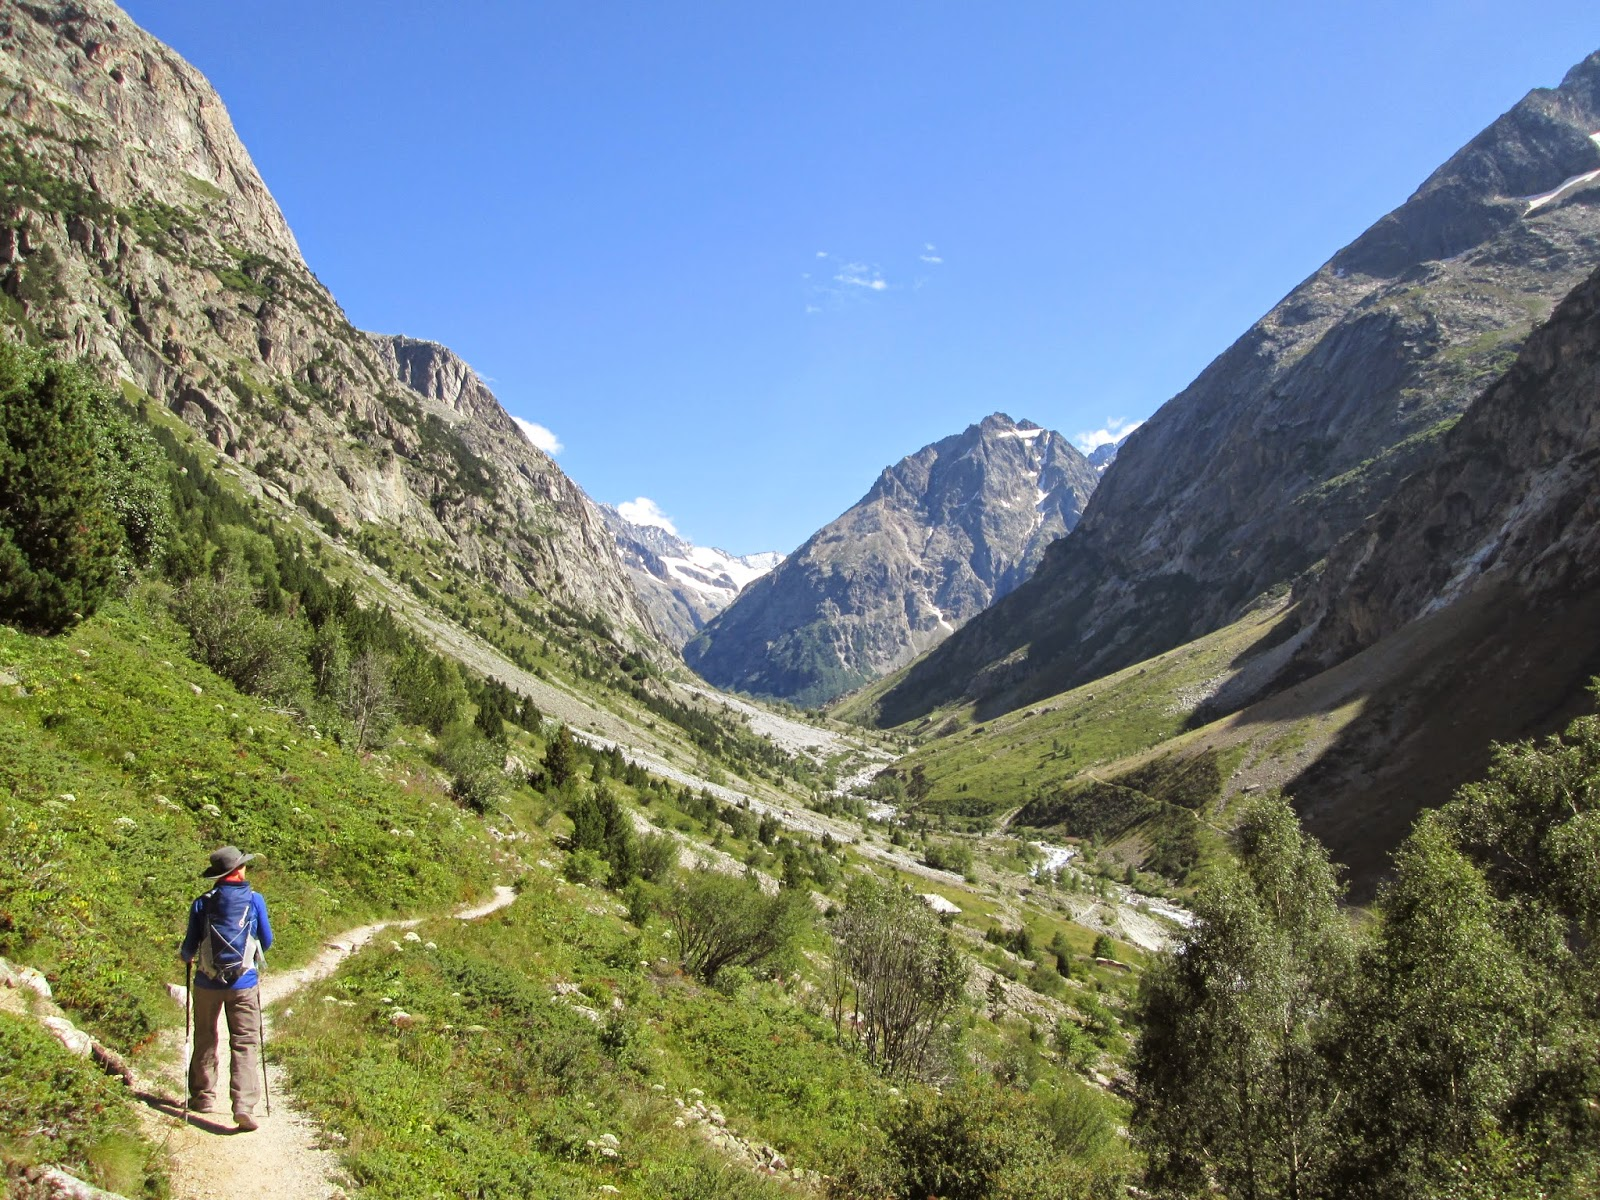 La Berarde, Ecrins National Park, Alps, France